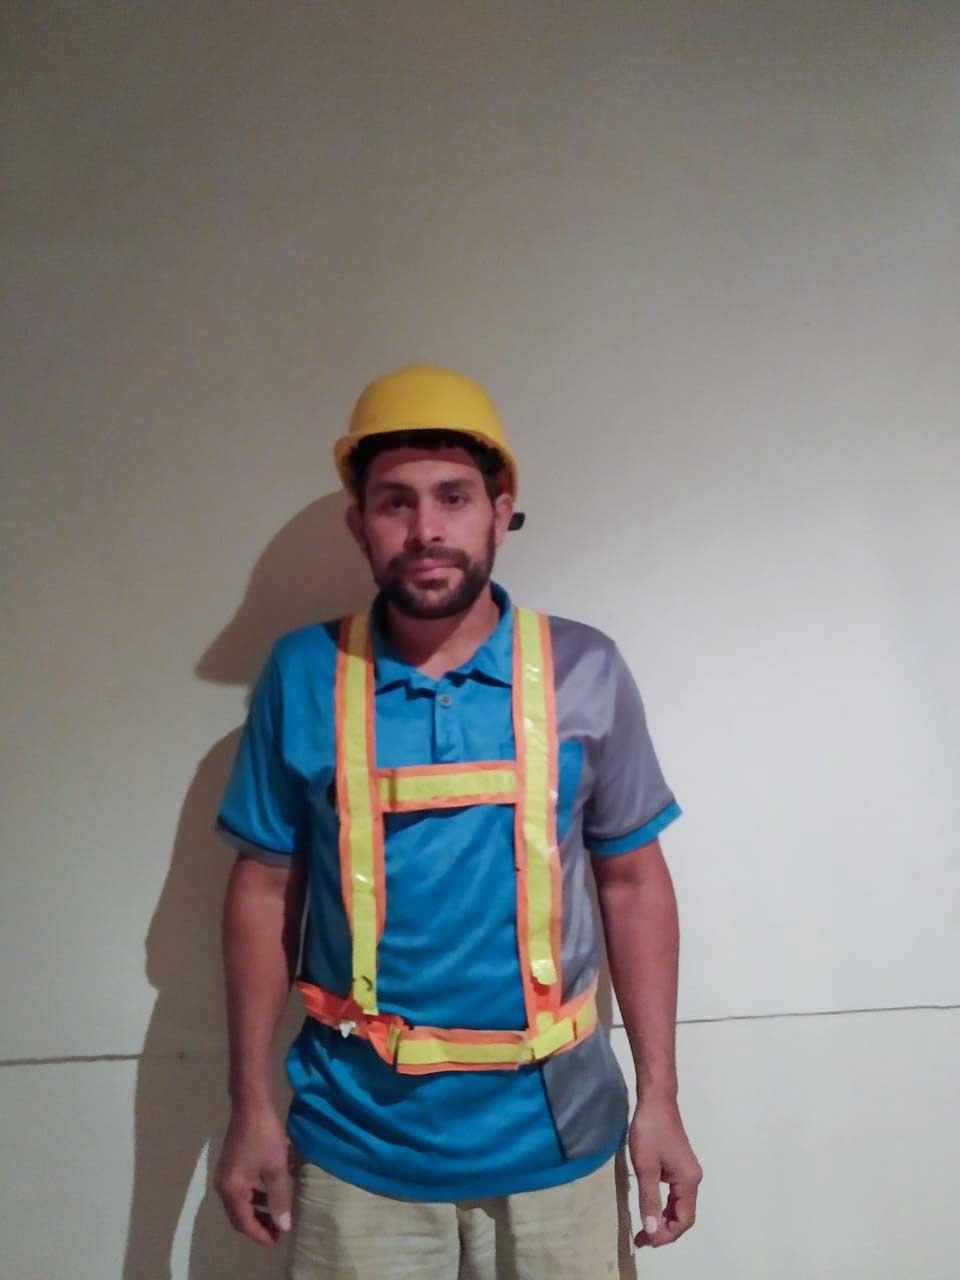 Construcciones GAMAR-Construcciones GAMAR Empresa Constructora de Pérez Zeledón 2